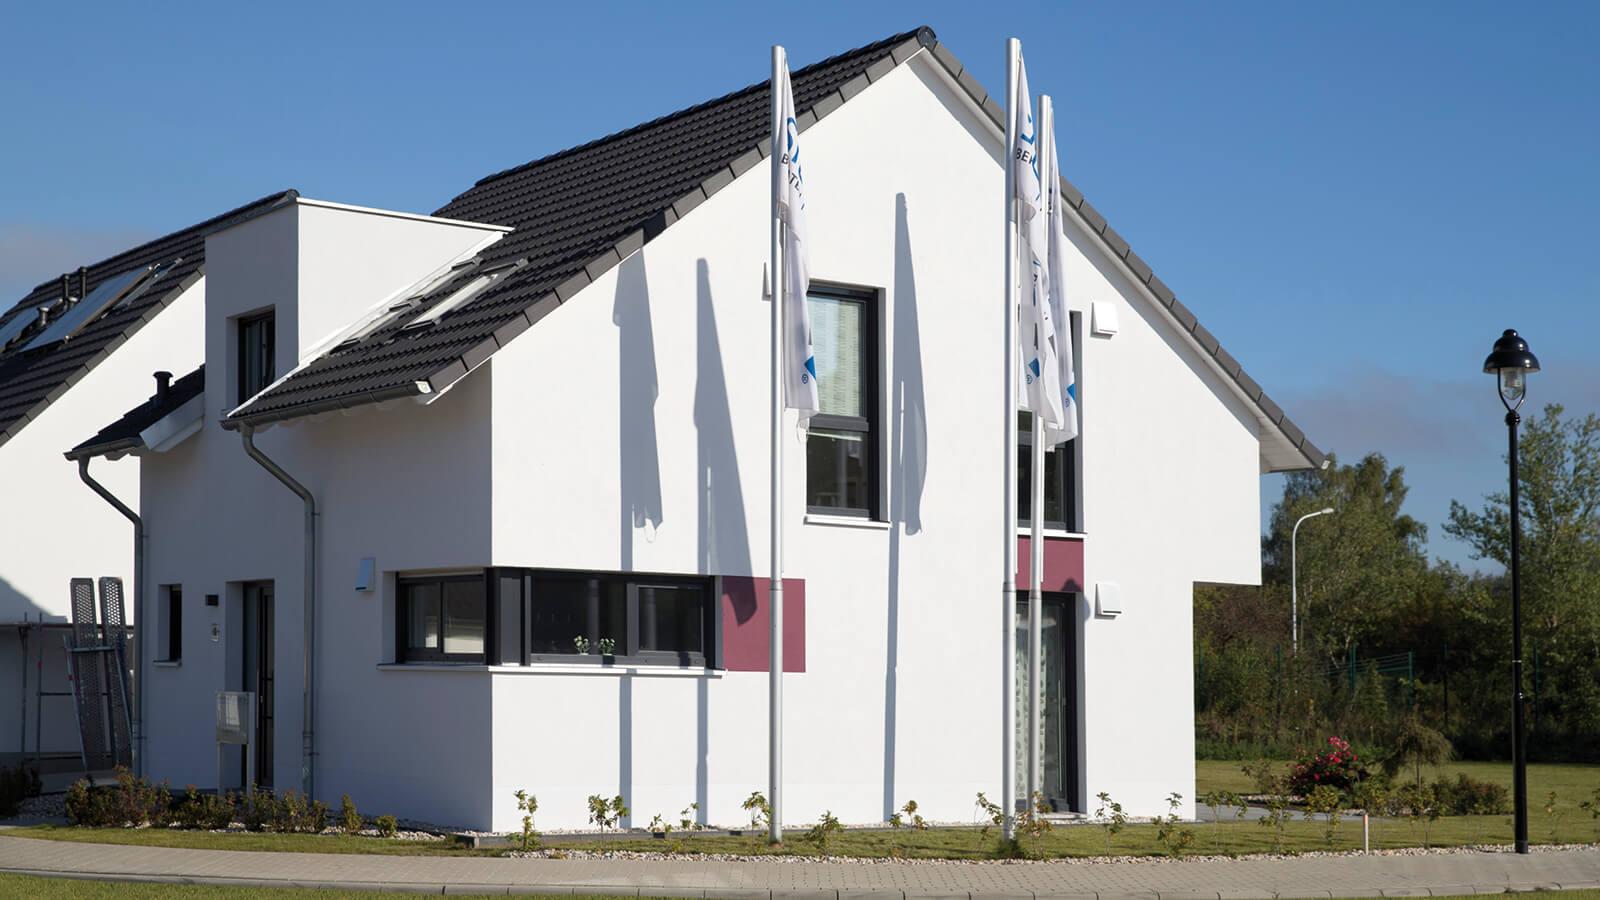 Musterhaus waldstra enviertel siewert hausbau for Haus bauen 2016